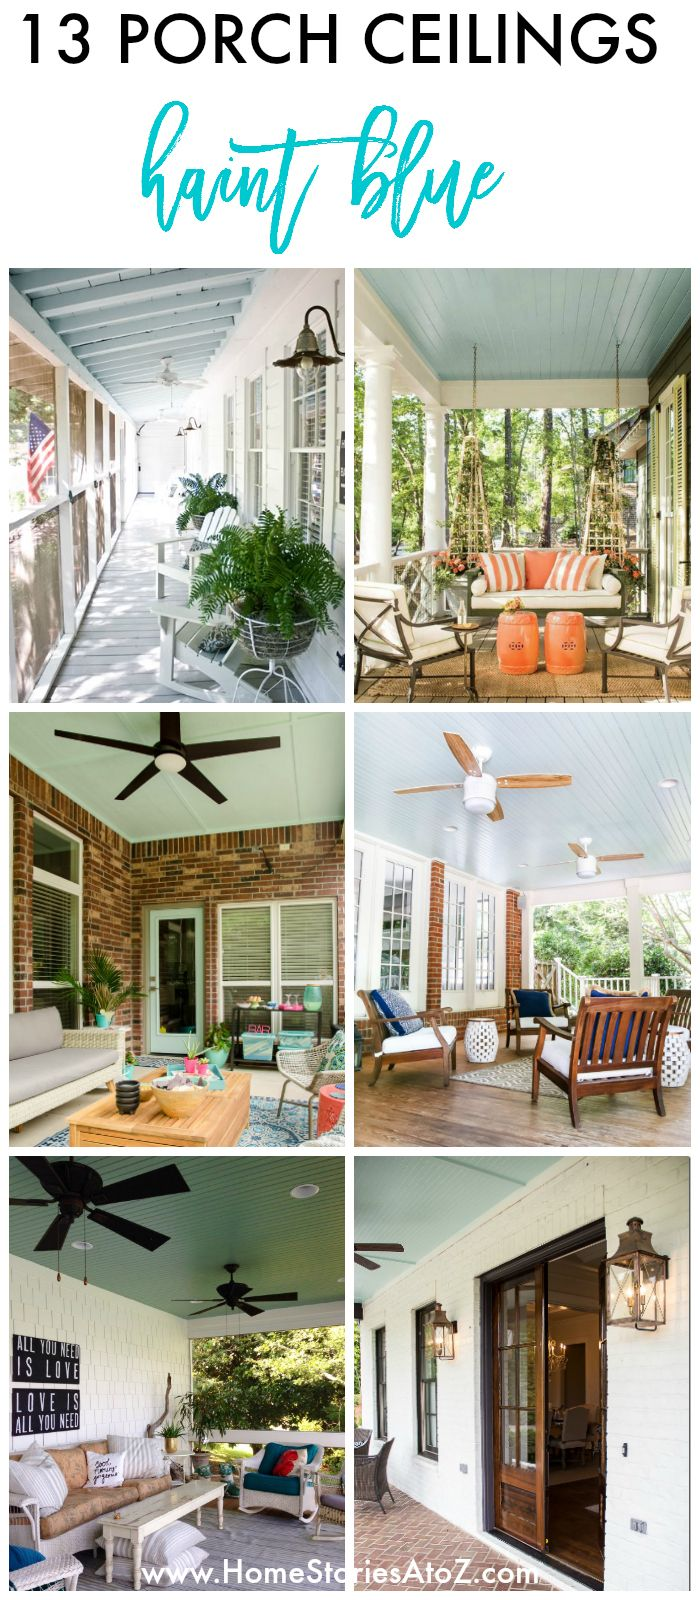 Best 25+ Haint blue porch ceiling ideas on Pinterest